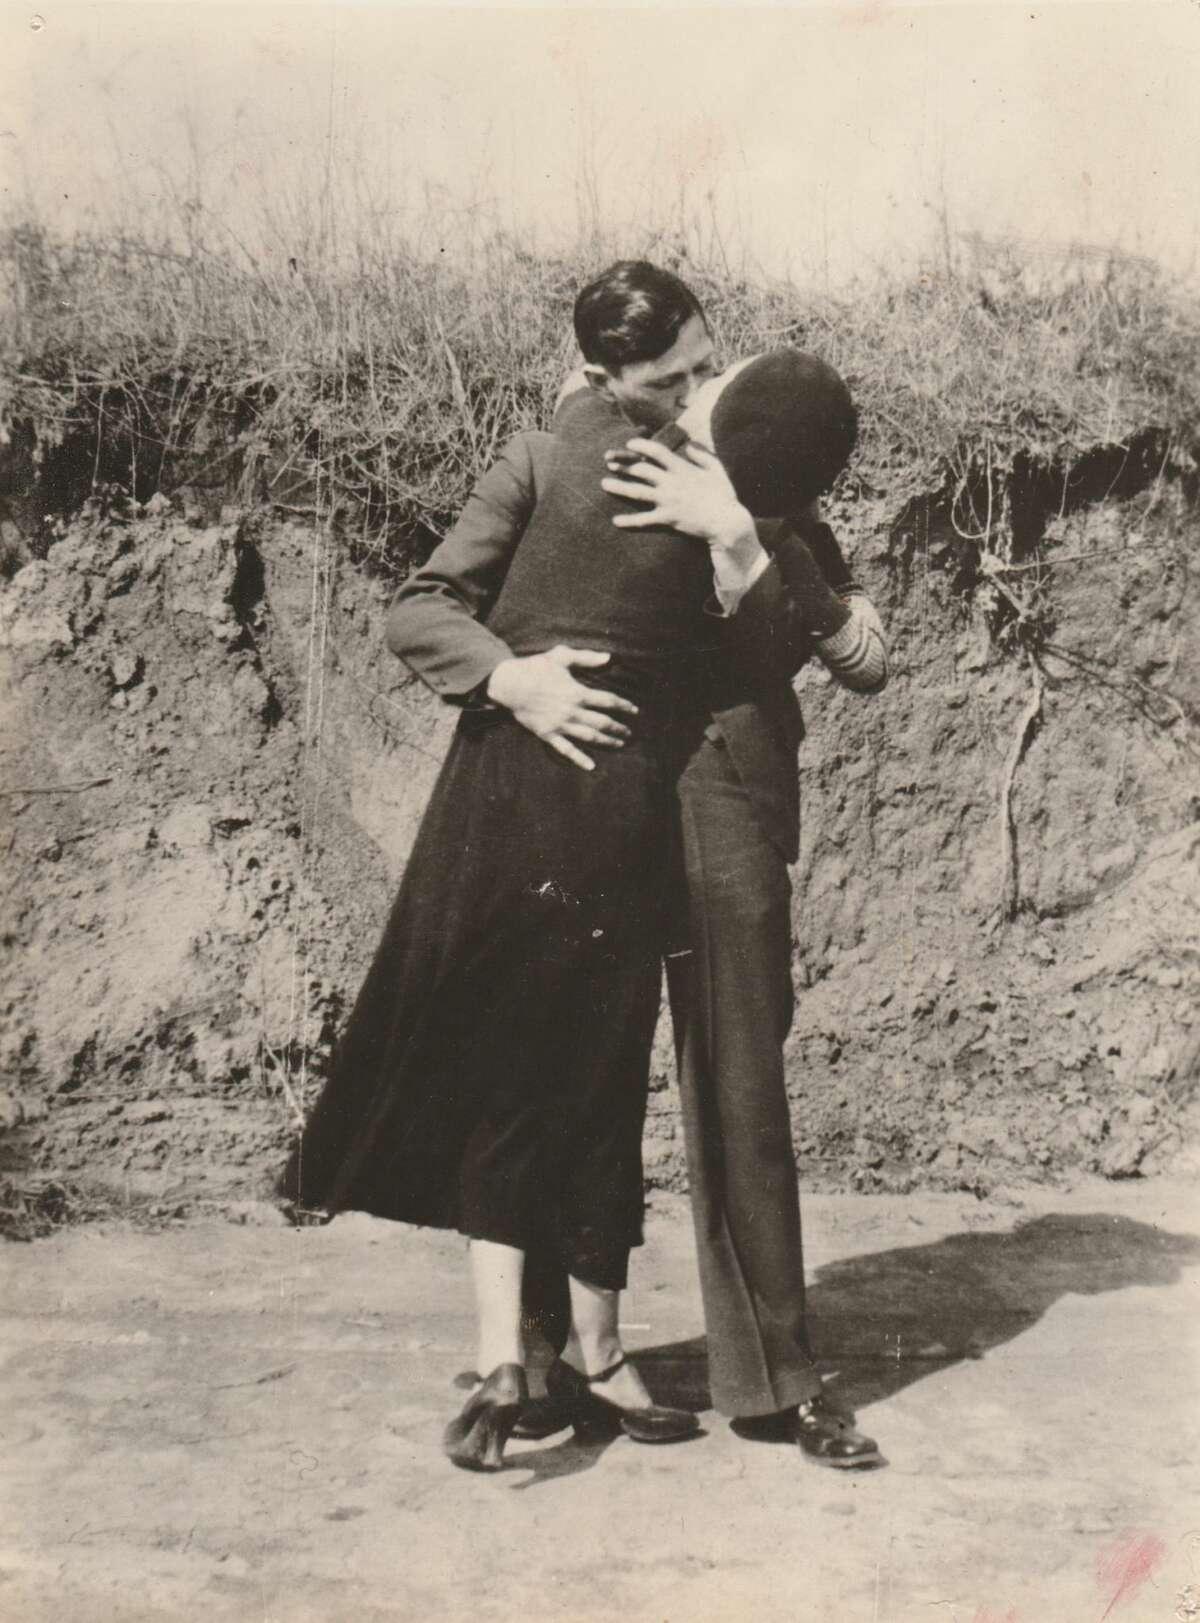 Bonnie & Clyde, Kissing & Embracing, 1933, Courtesy PDNB Gallery, Dallas, TX